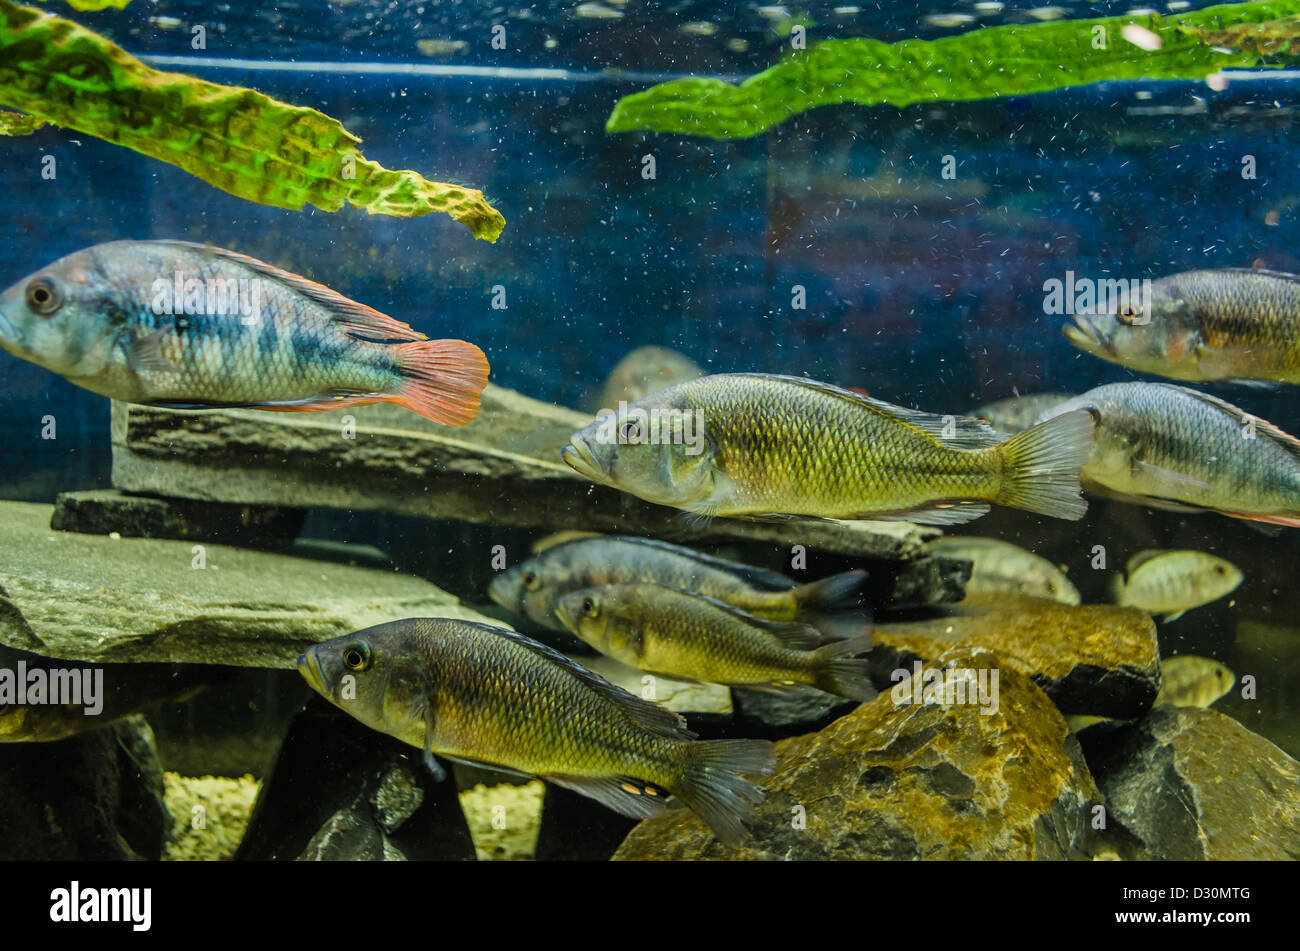 Aquarium with colorful pet fish at \